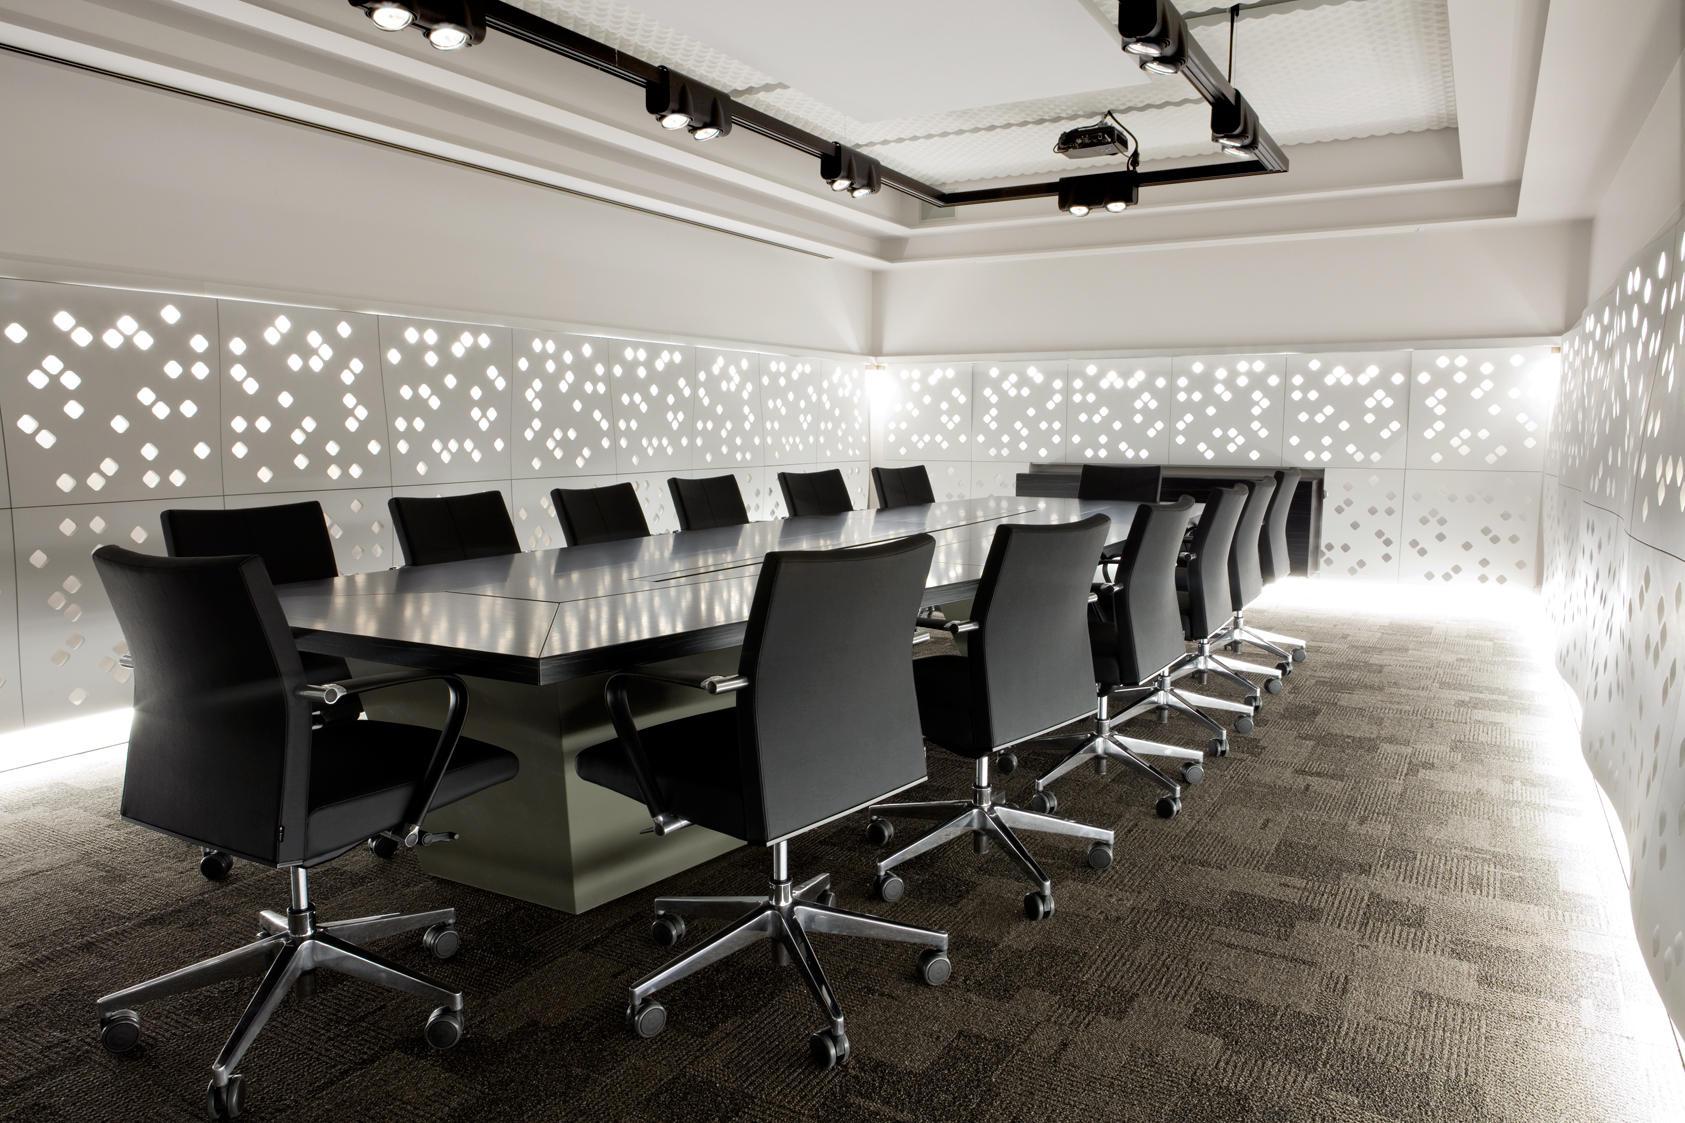 office interior lights led lighting